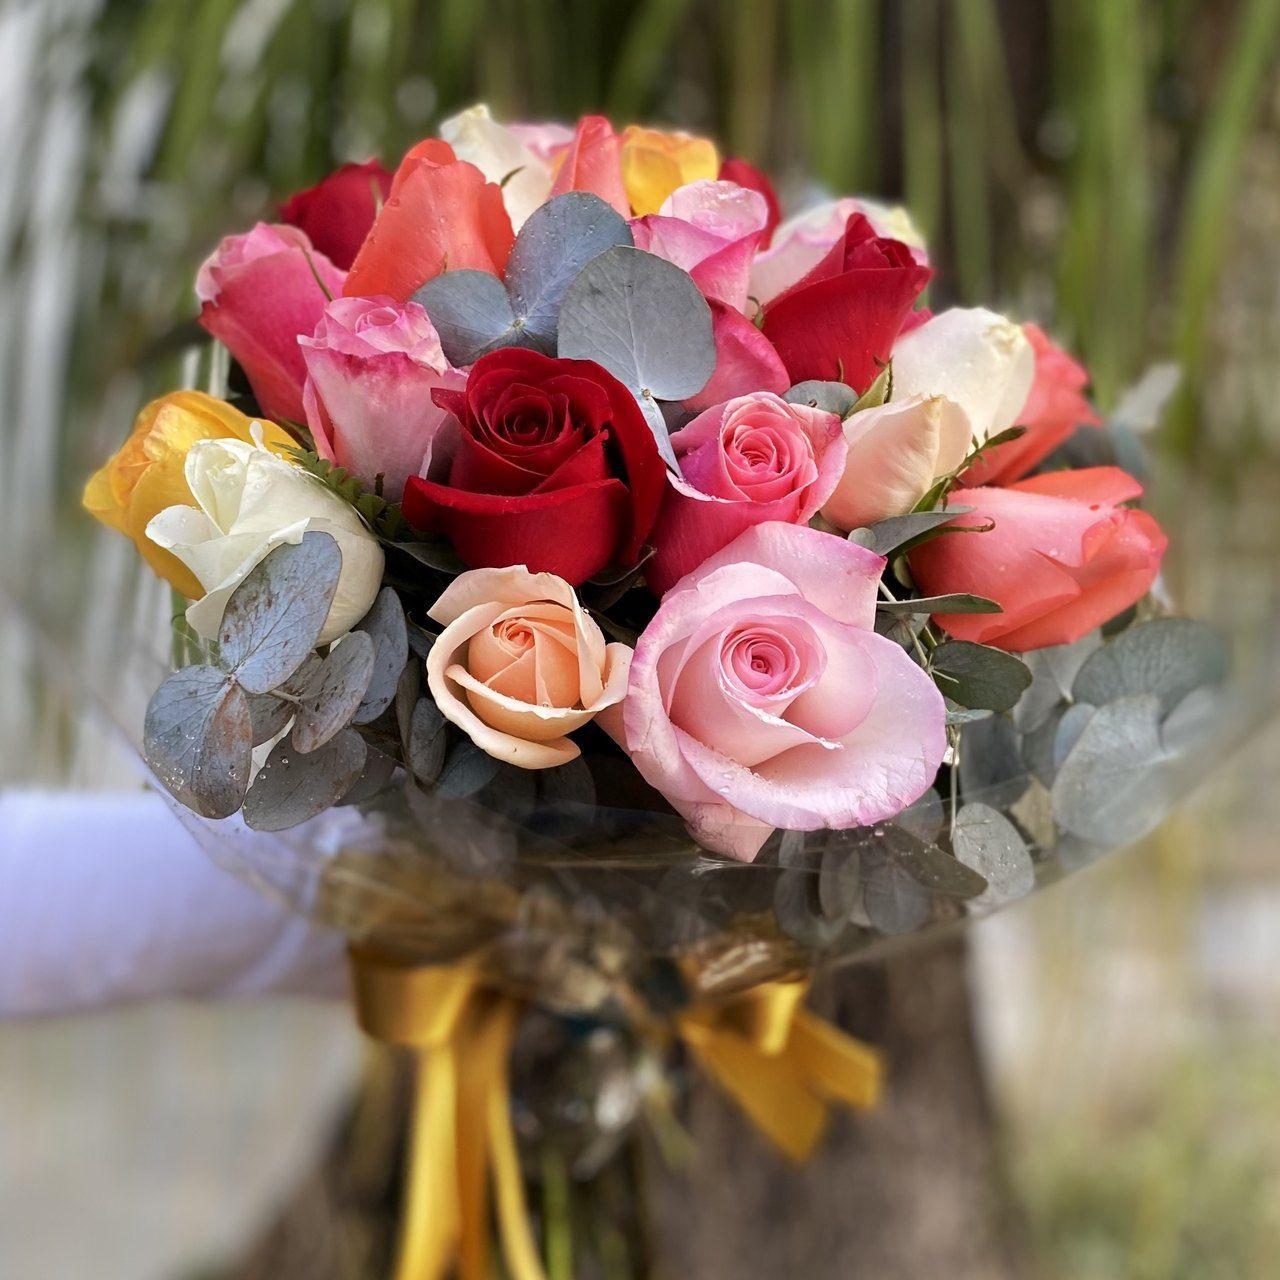 Ramalhete de rosas coloridas